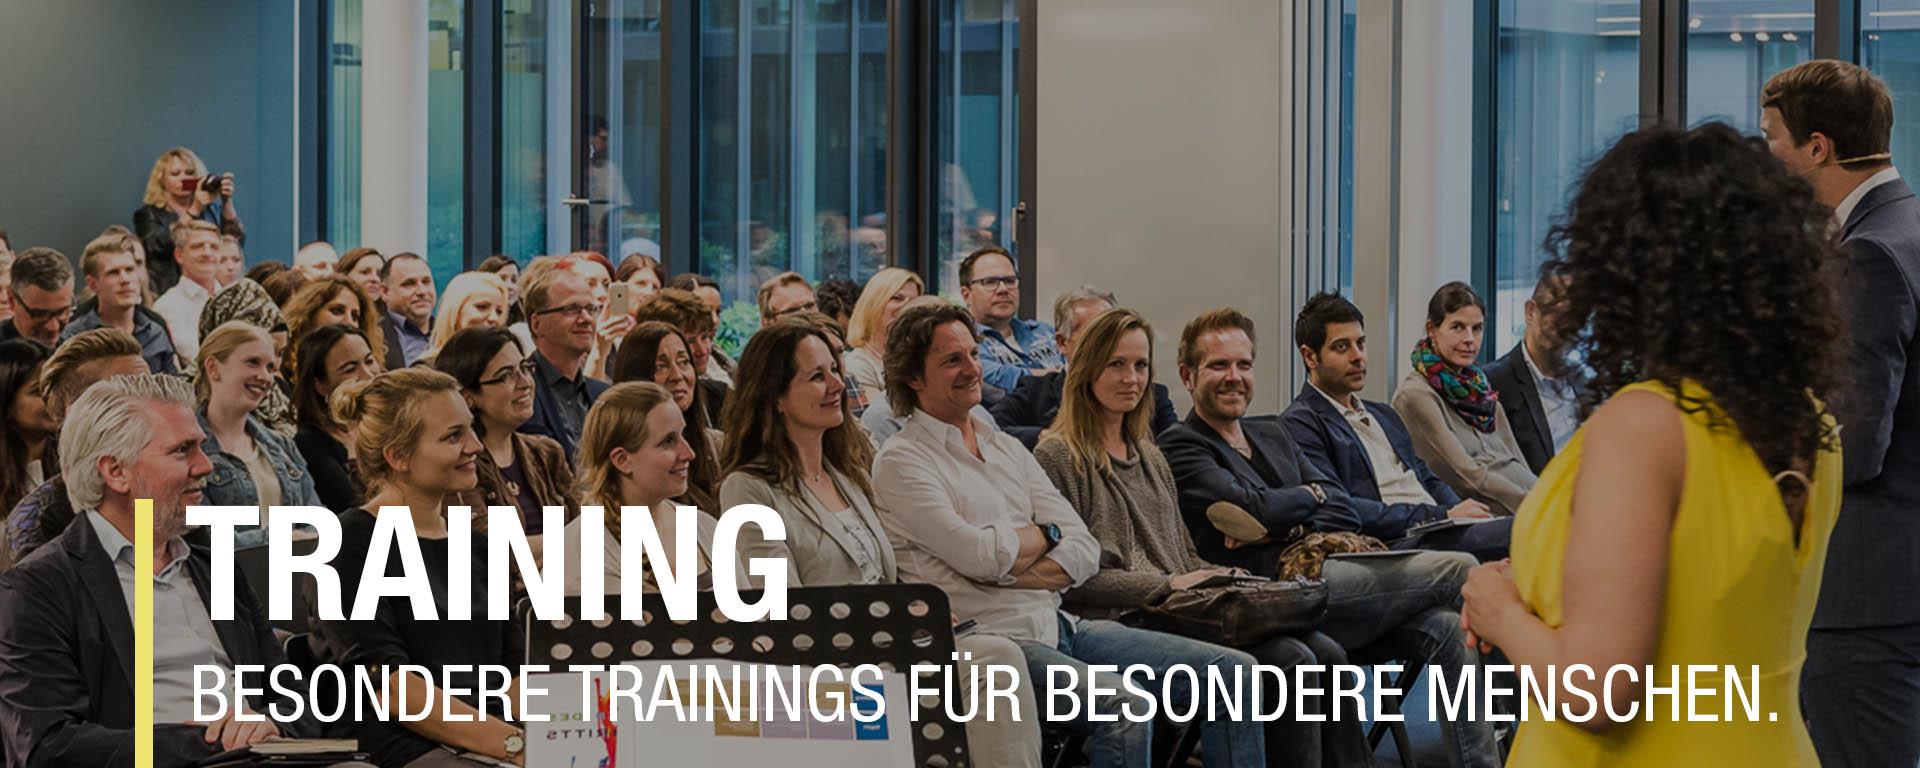 Trainings, Training, Leadership, Changemanagement, Kommunikation